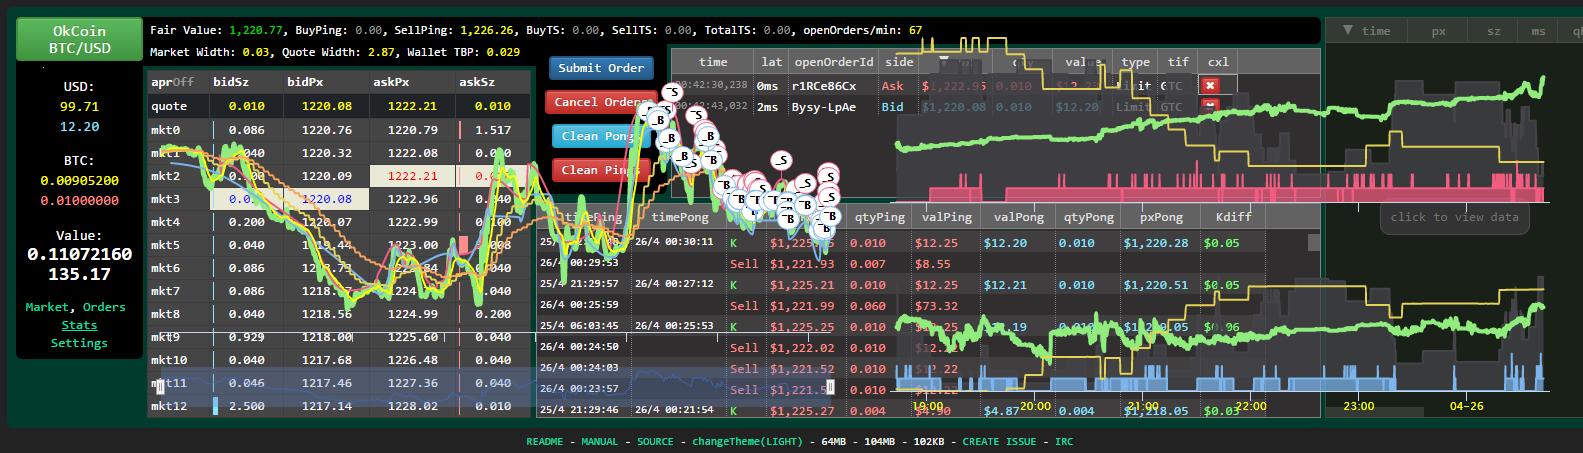 crypto trading bot github python kolektyvinė 2 prekybos sistema